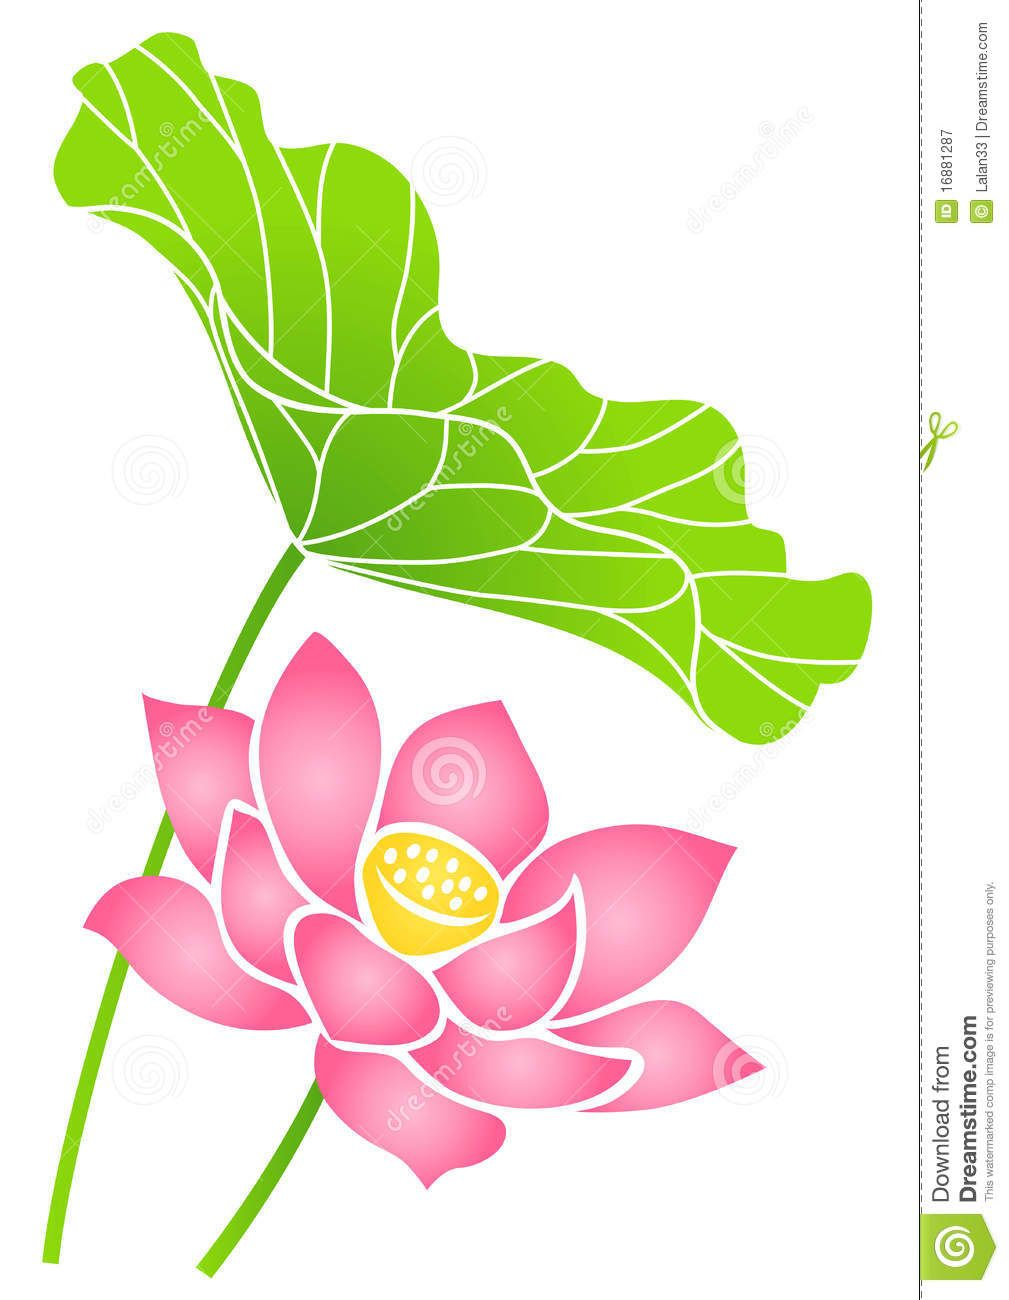 Free Lotus Vector Art 3672 Free Downloads Lotus Flower Vector Art